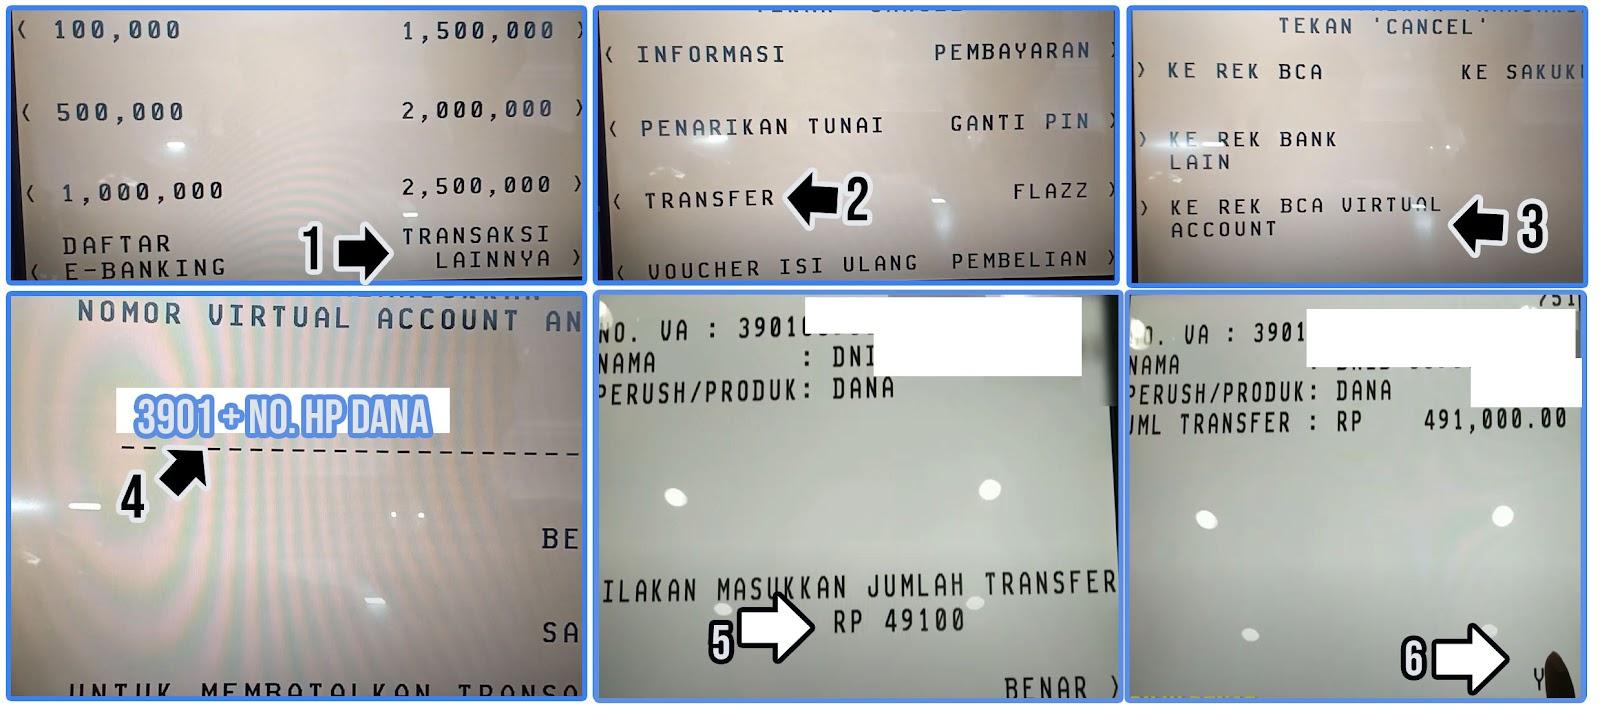 Cara Top Up Dana Lewat ATM BCA